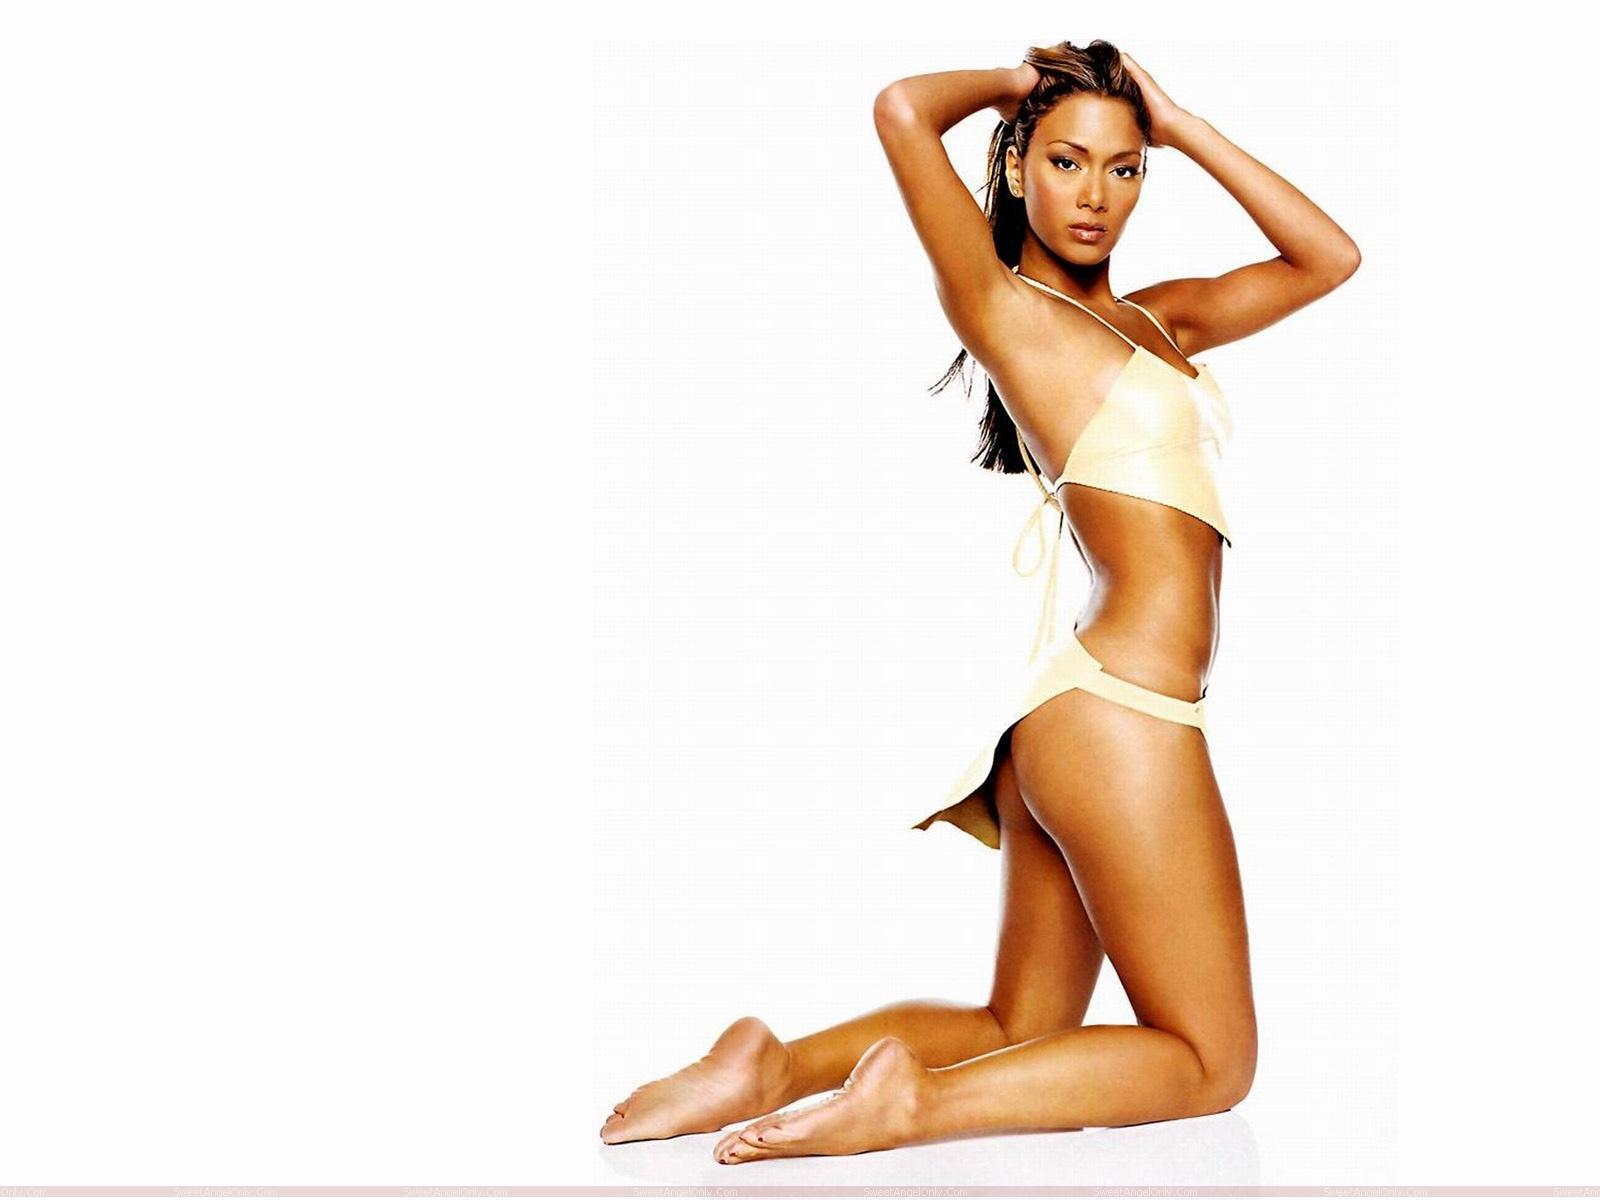 http://3.bp.blogspot.com/-nTIJdlBR8ZQ/TaMCtour7tI/AAAAAAAAGSM/9Lc22N-2xOA/s1600/nicole_scherzinger_bikini_wallpaper.jpg